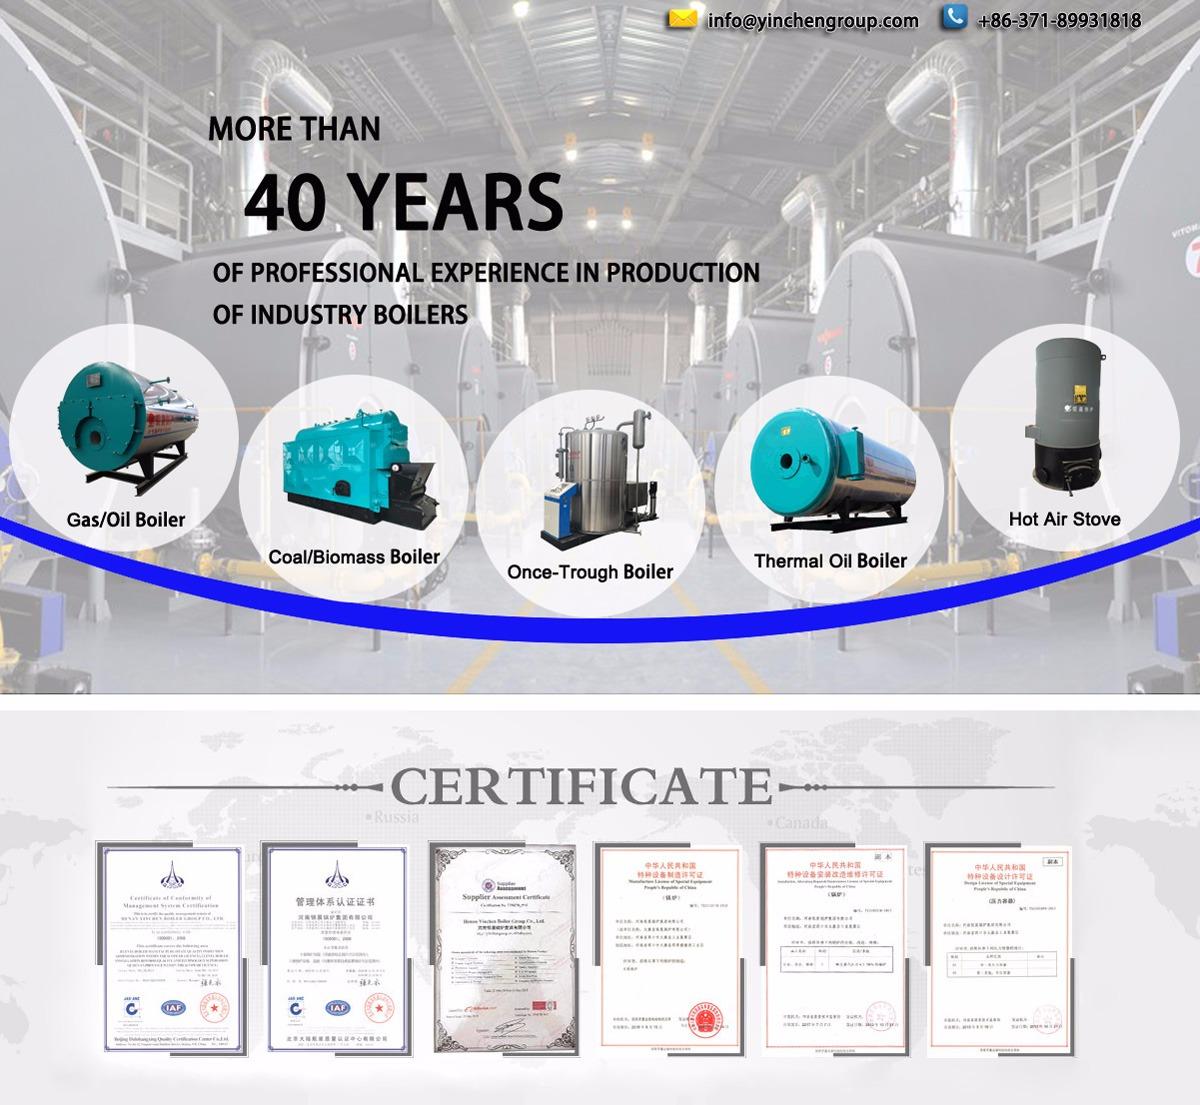 Henan Yinchen Boiler Group Co., Ltd. - Steam Boiler, Hot Water Boiler